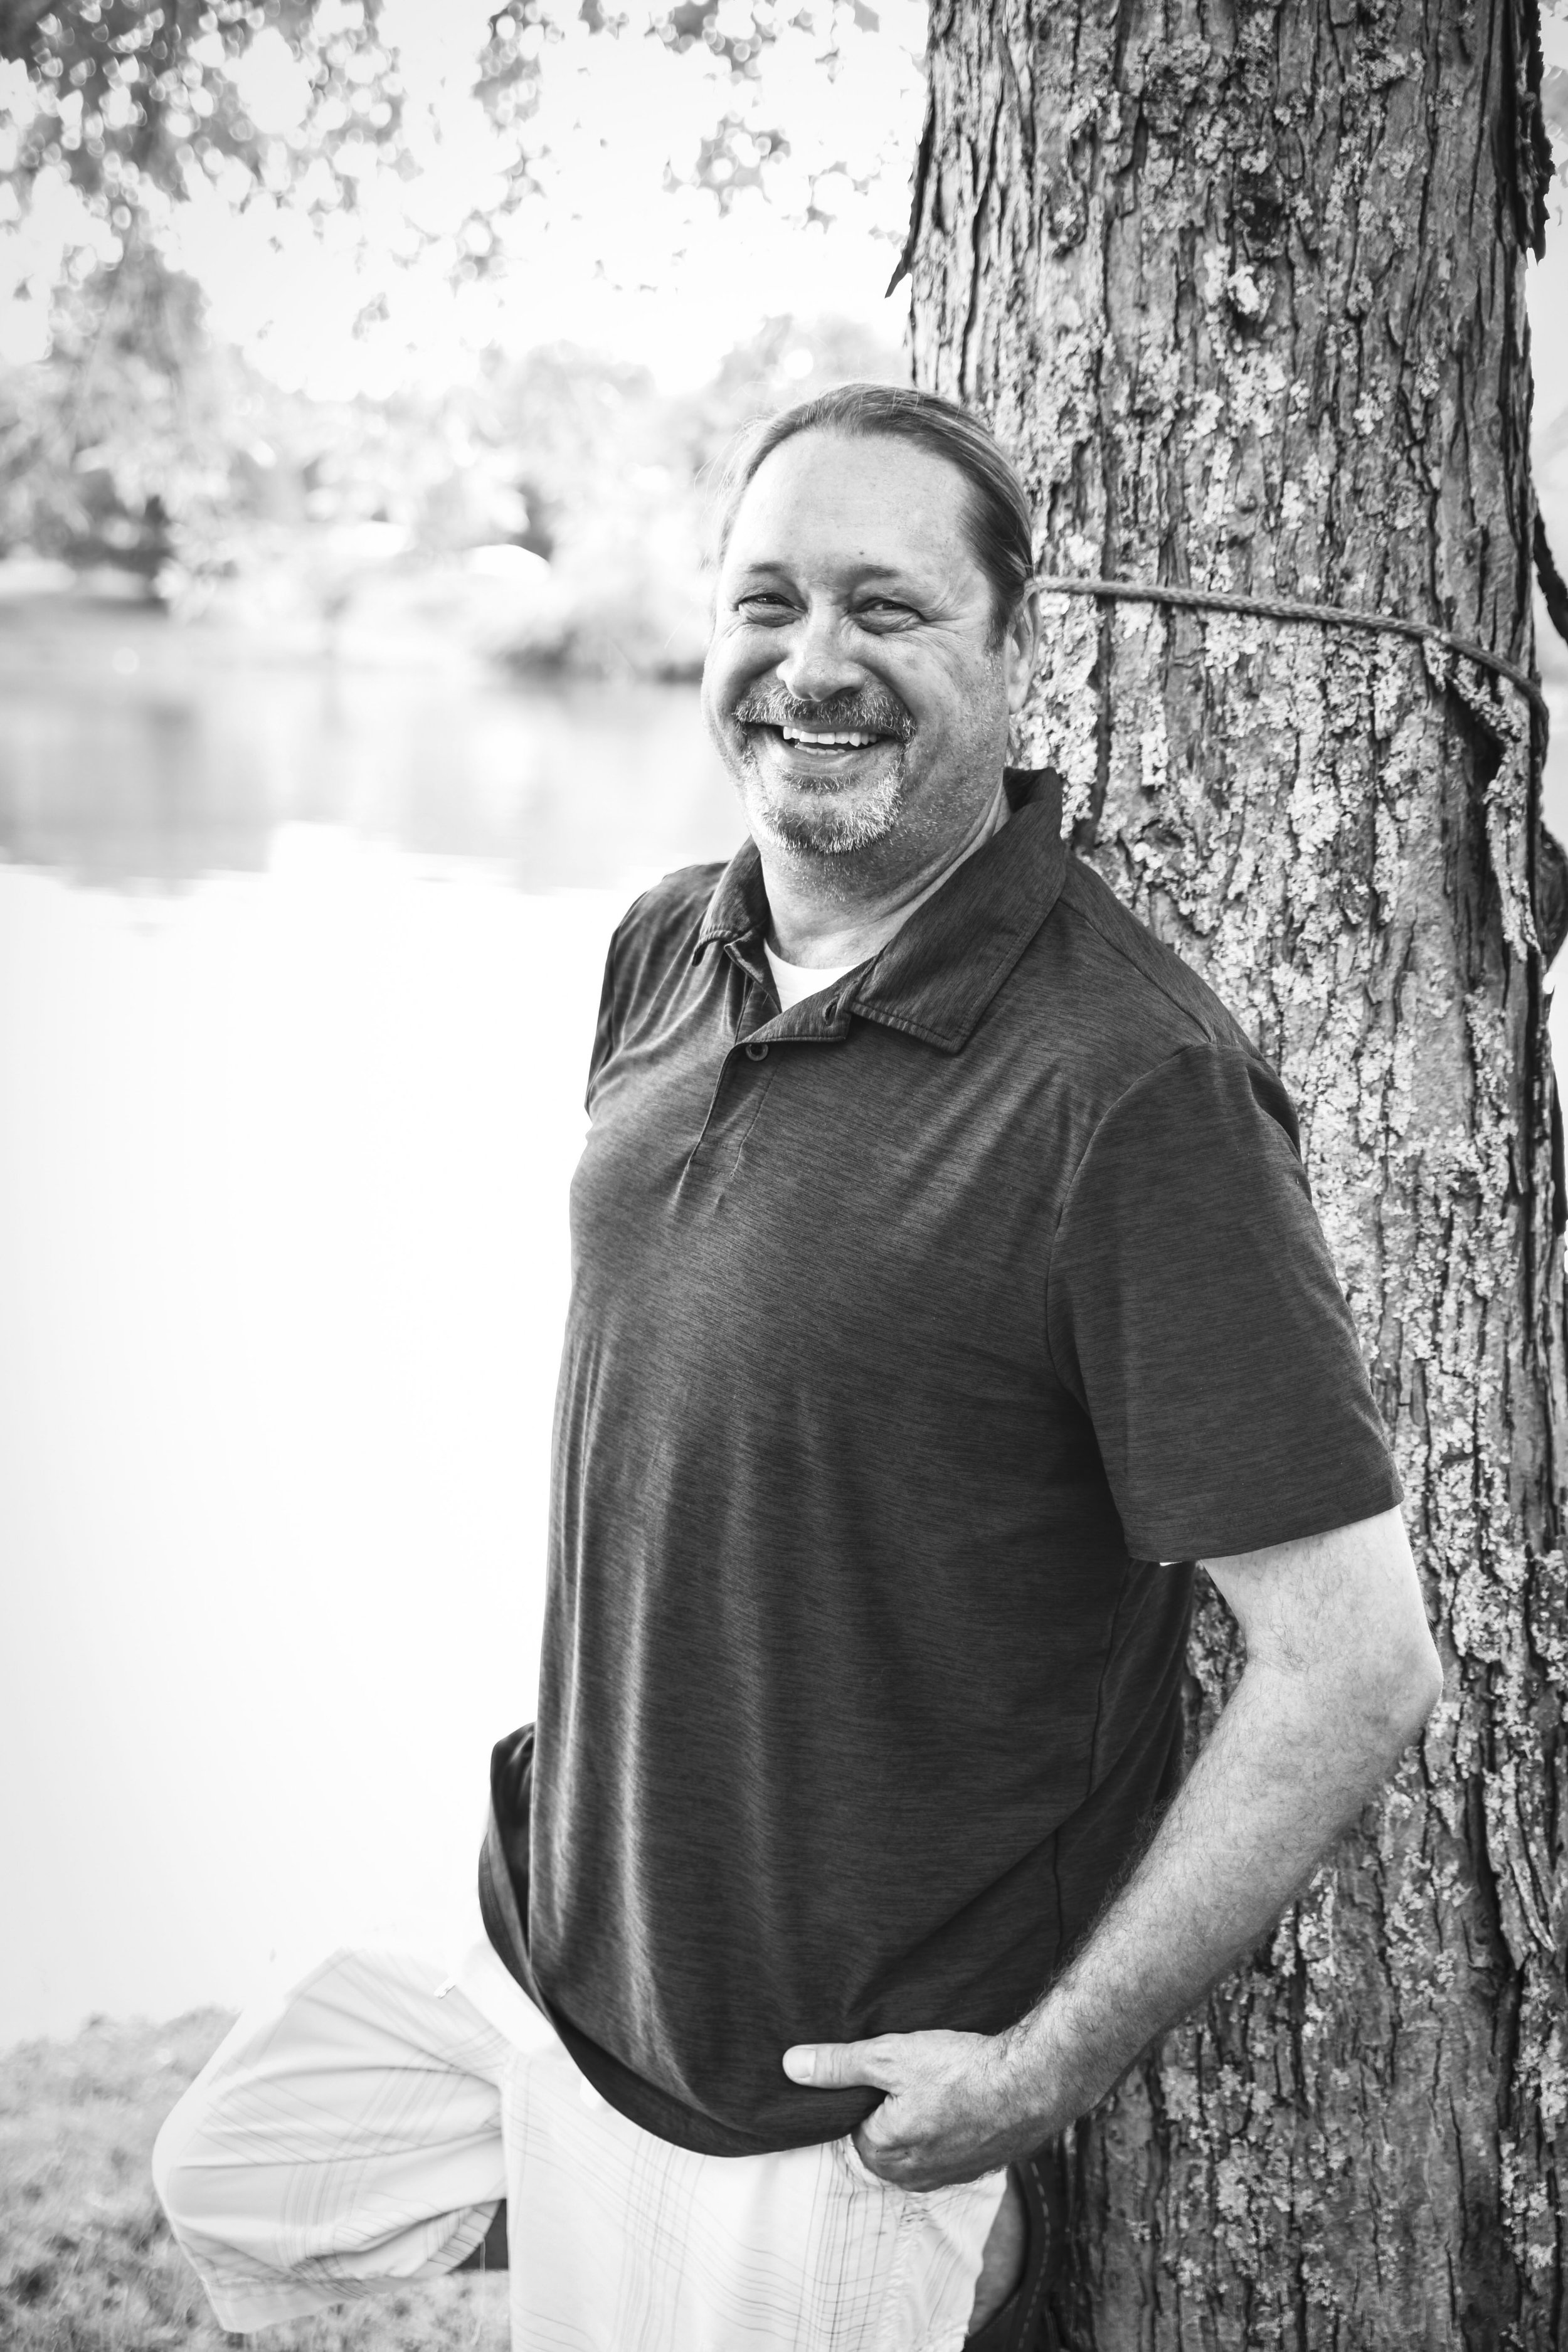 Shawn Hiser, Graphics Specialist